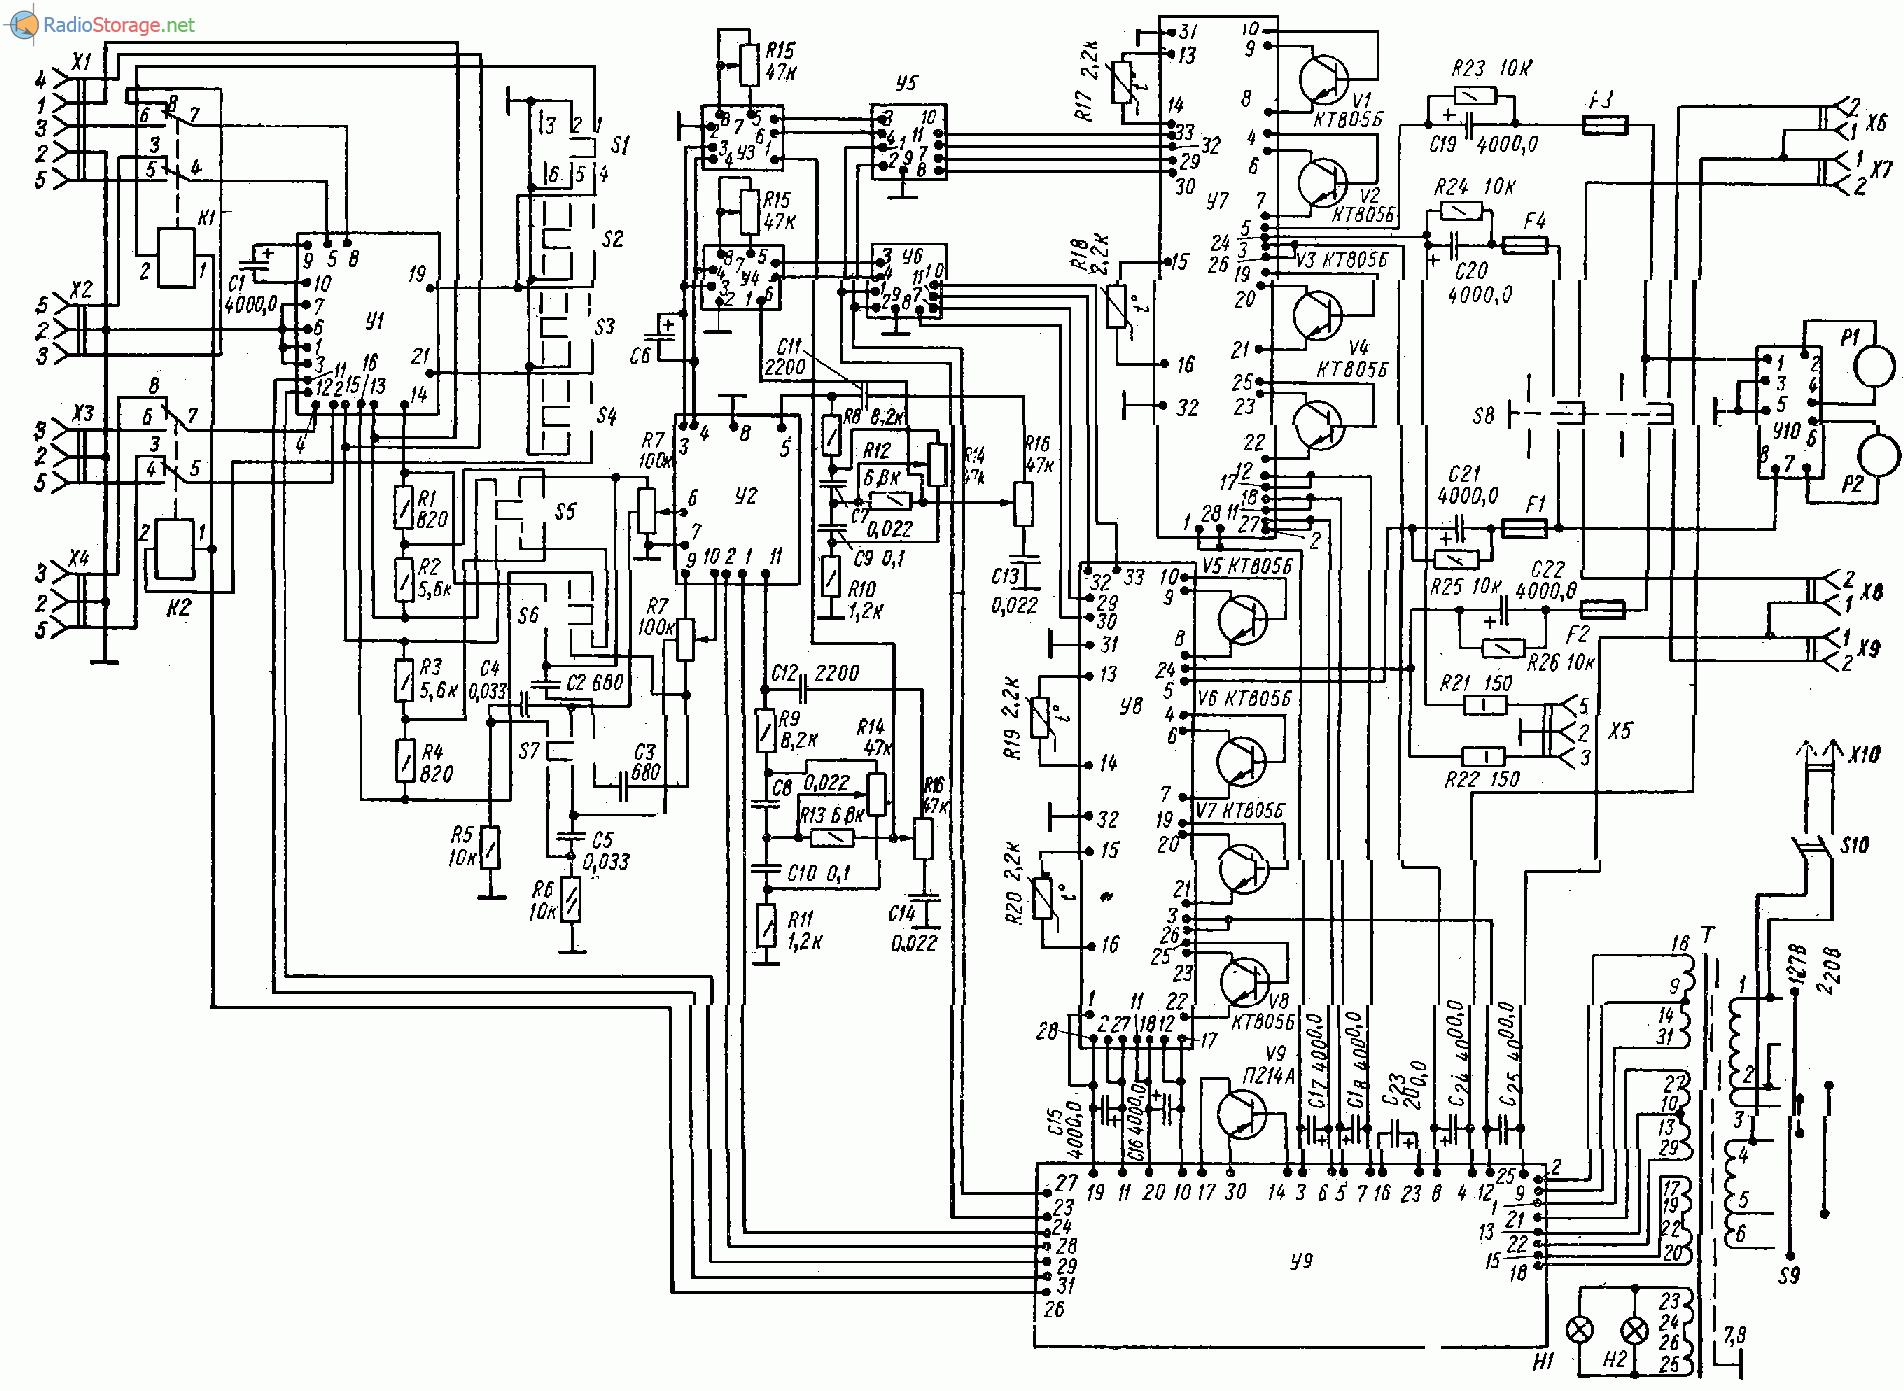 Магнитофон ростов 102 схема фото 203